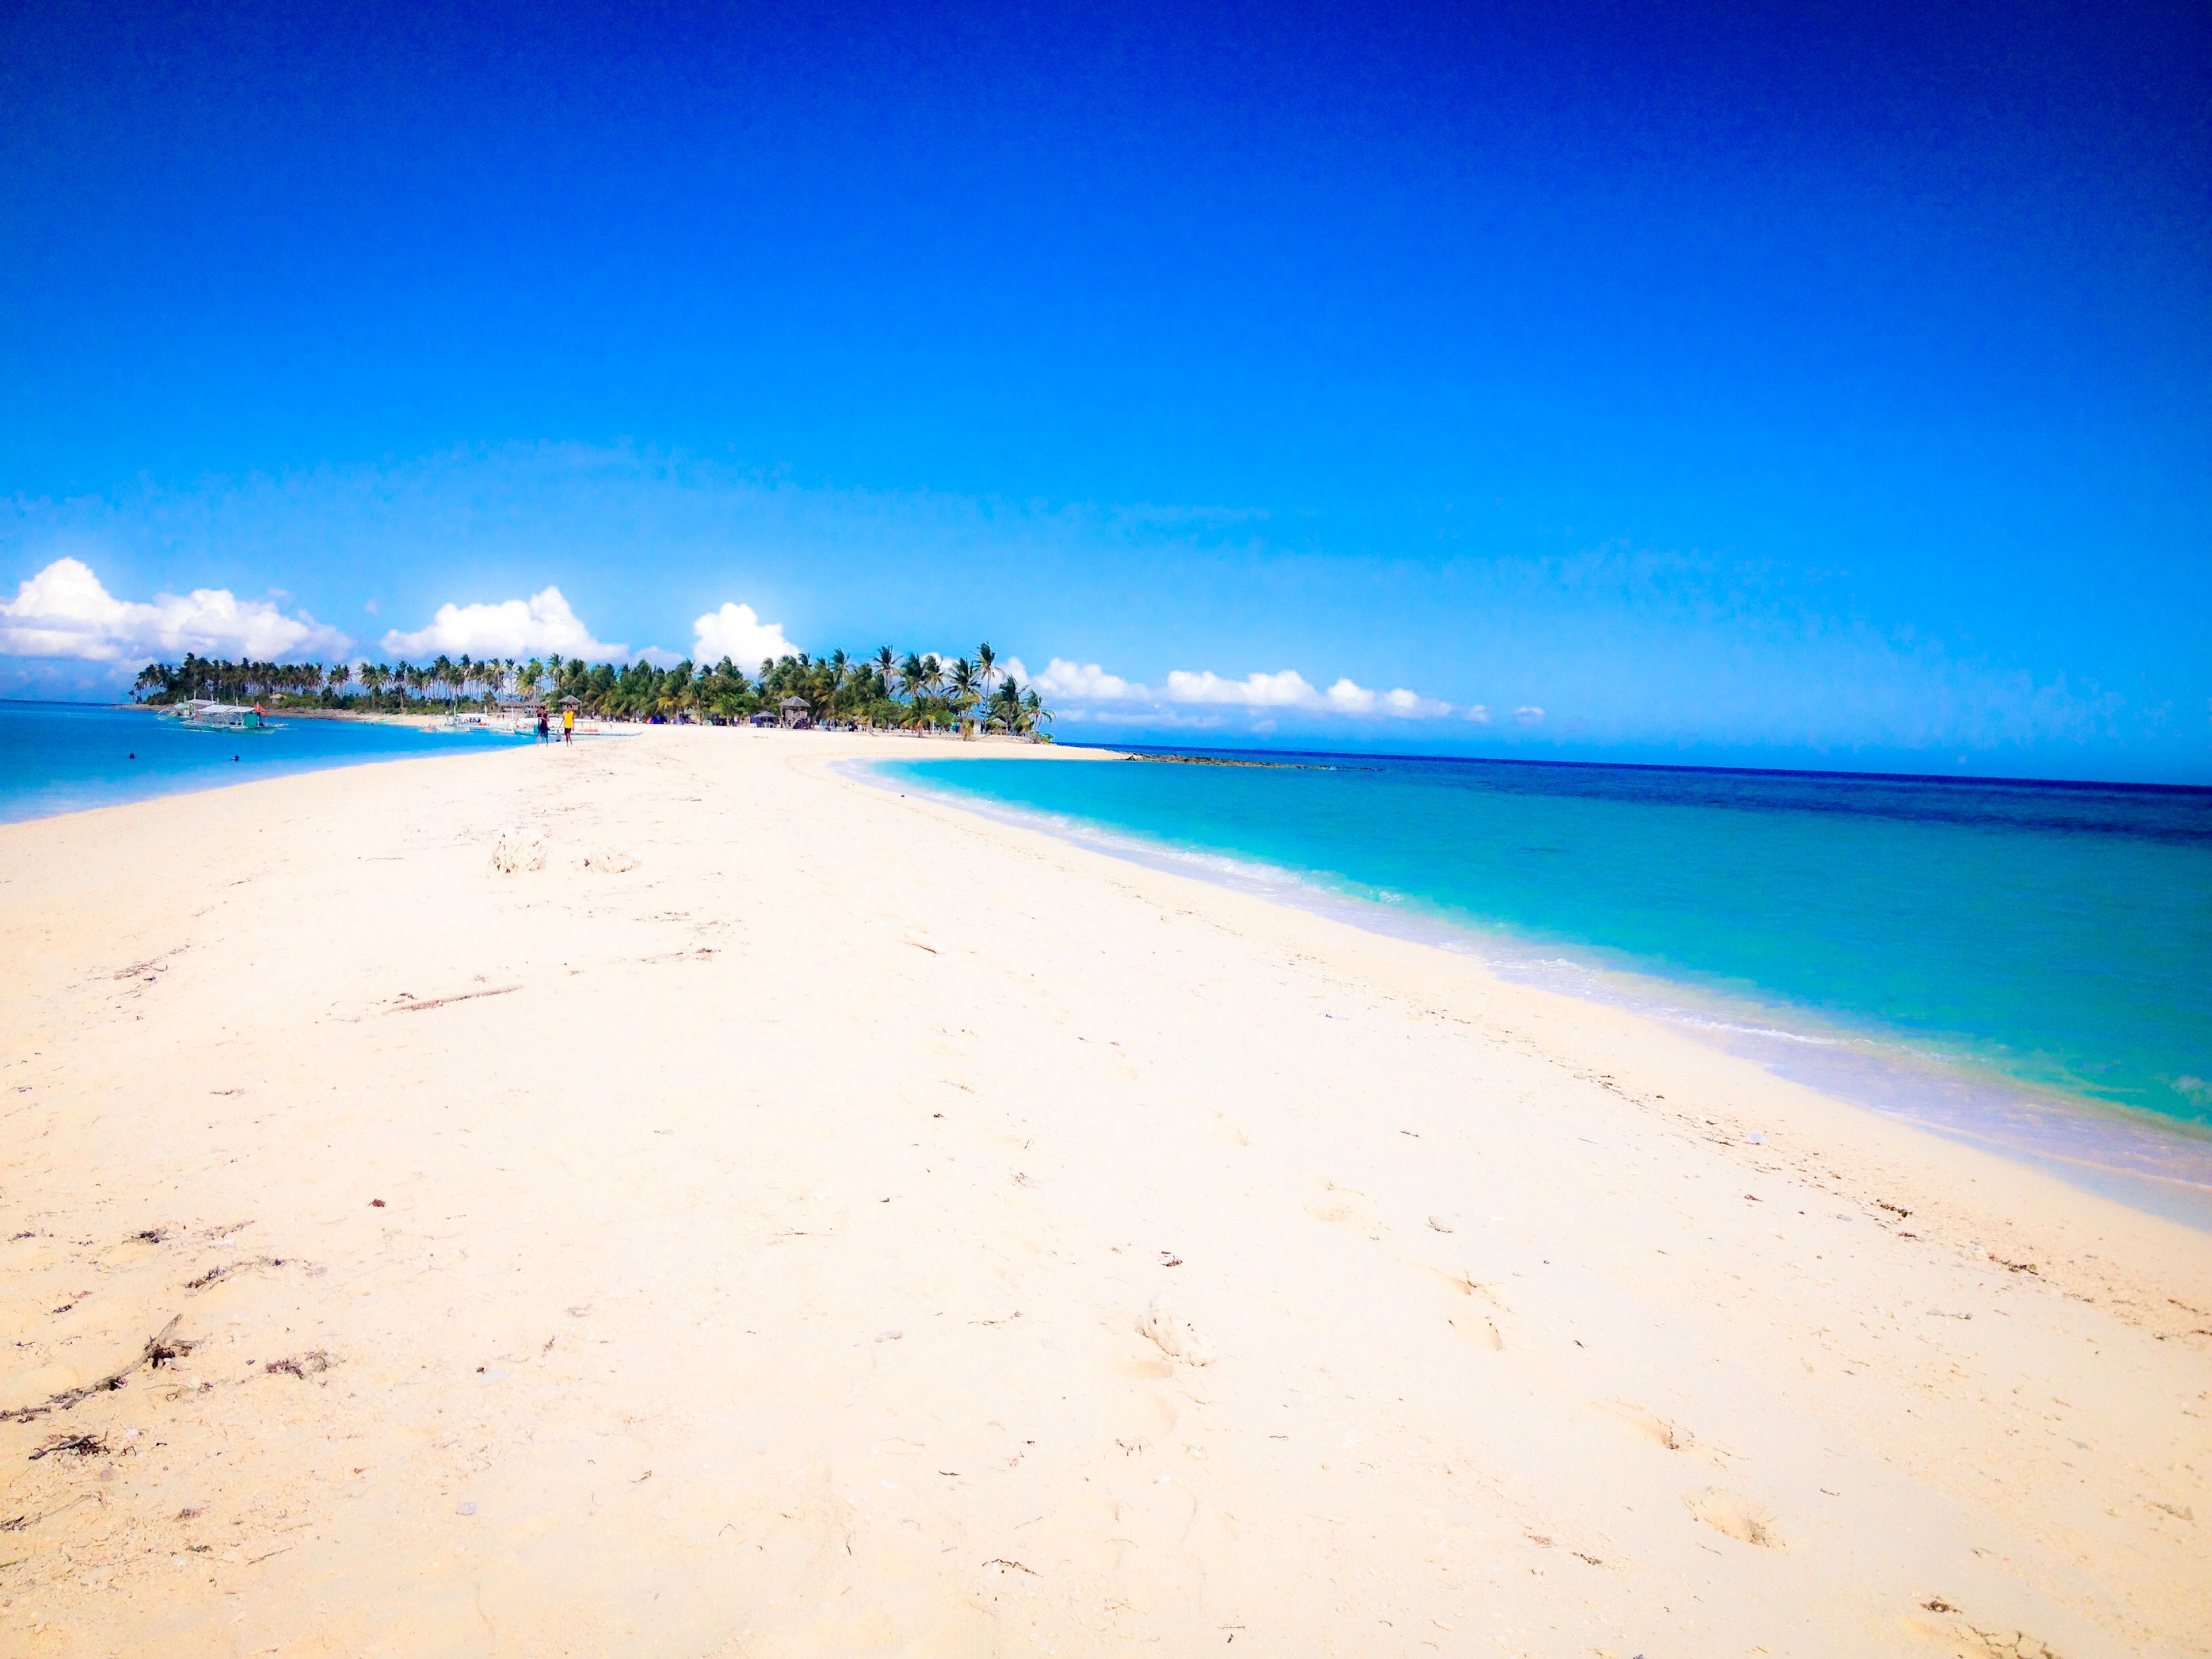 Summer Paradise.. Just gotta love the sandbar!!! ❤️